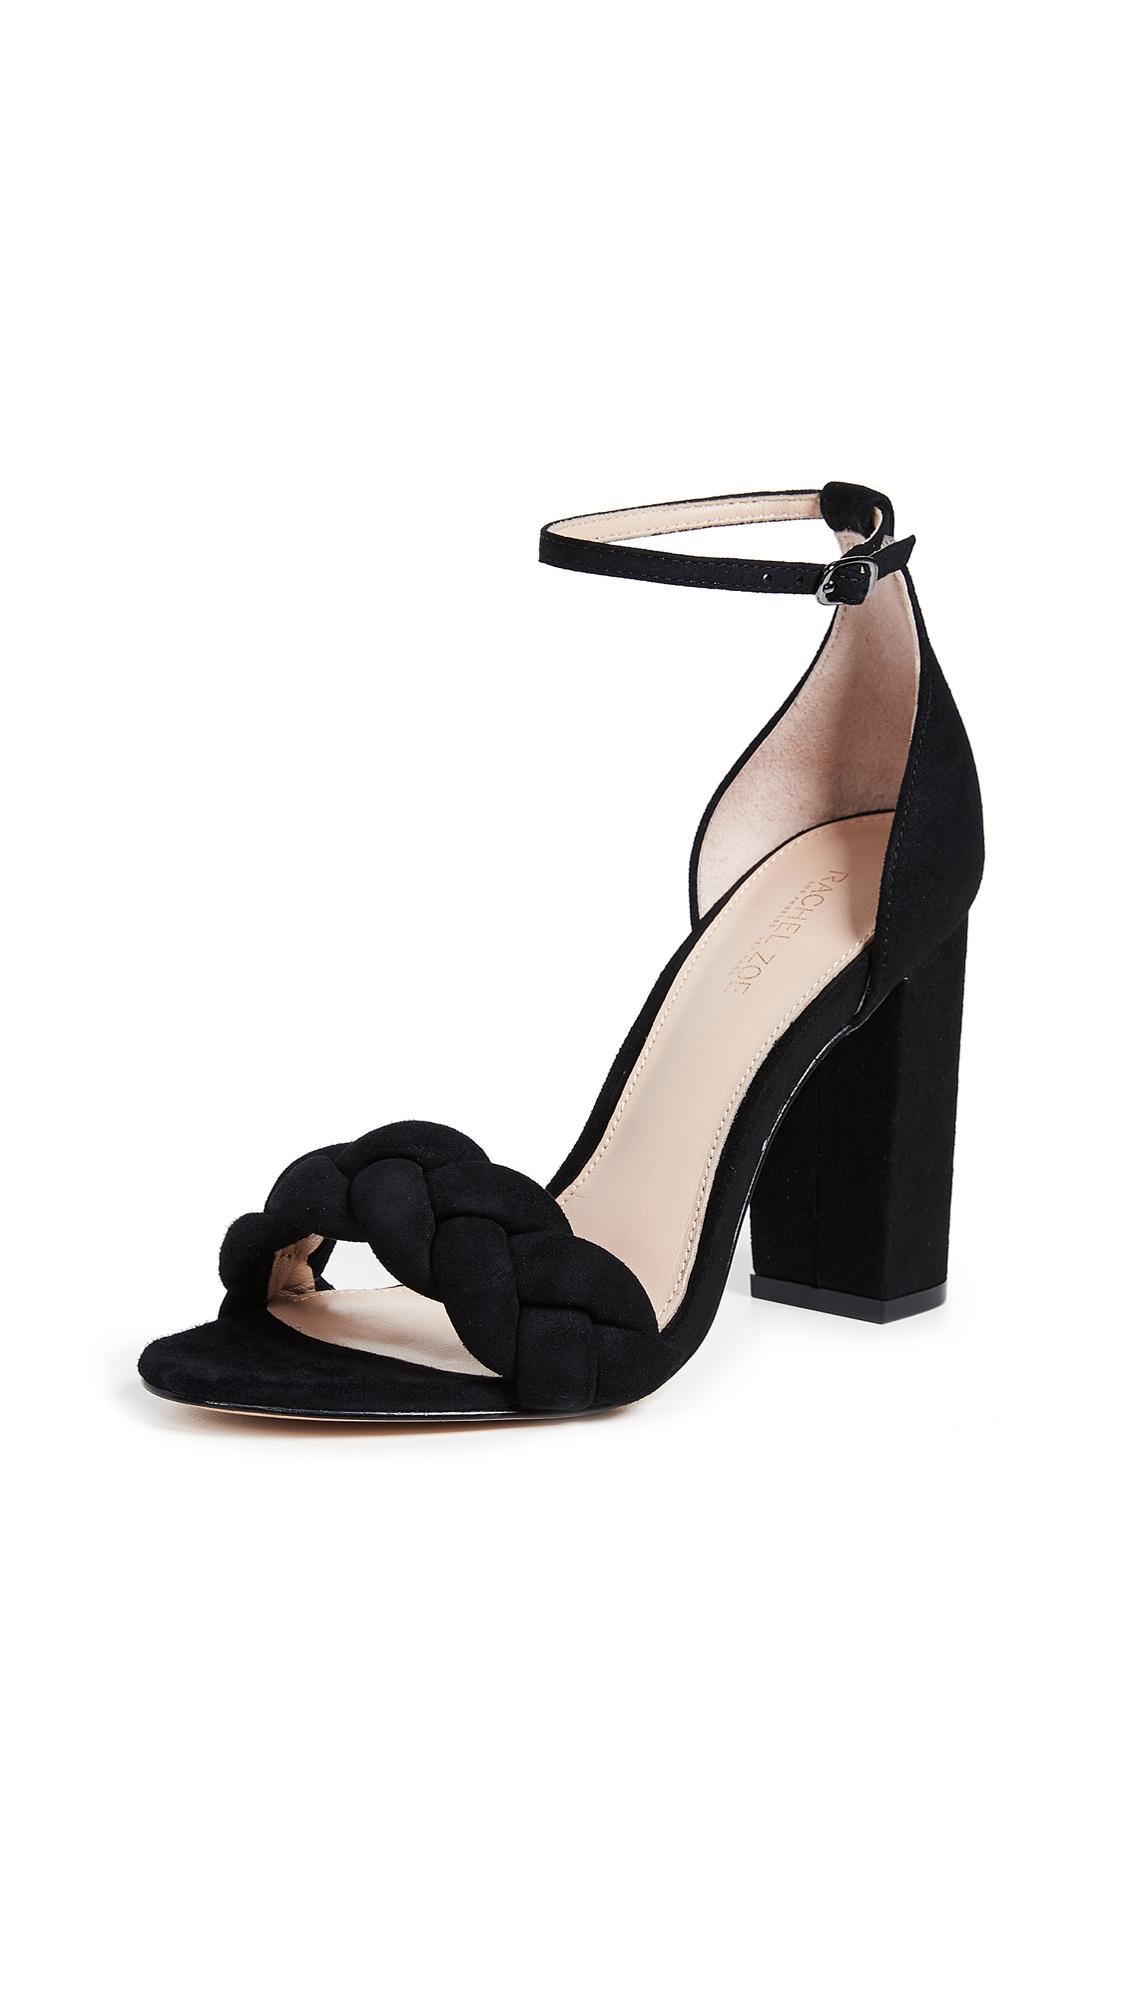 Rachel Zoe Ashton Block Heel City Sandals - Black